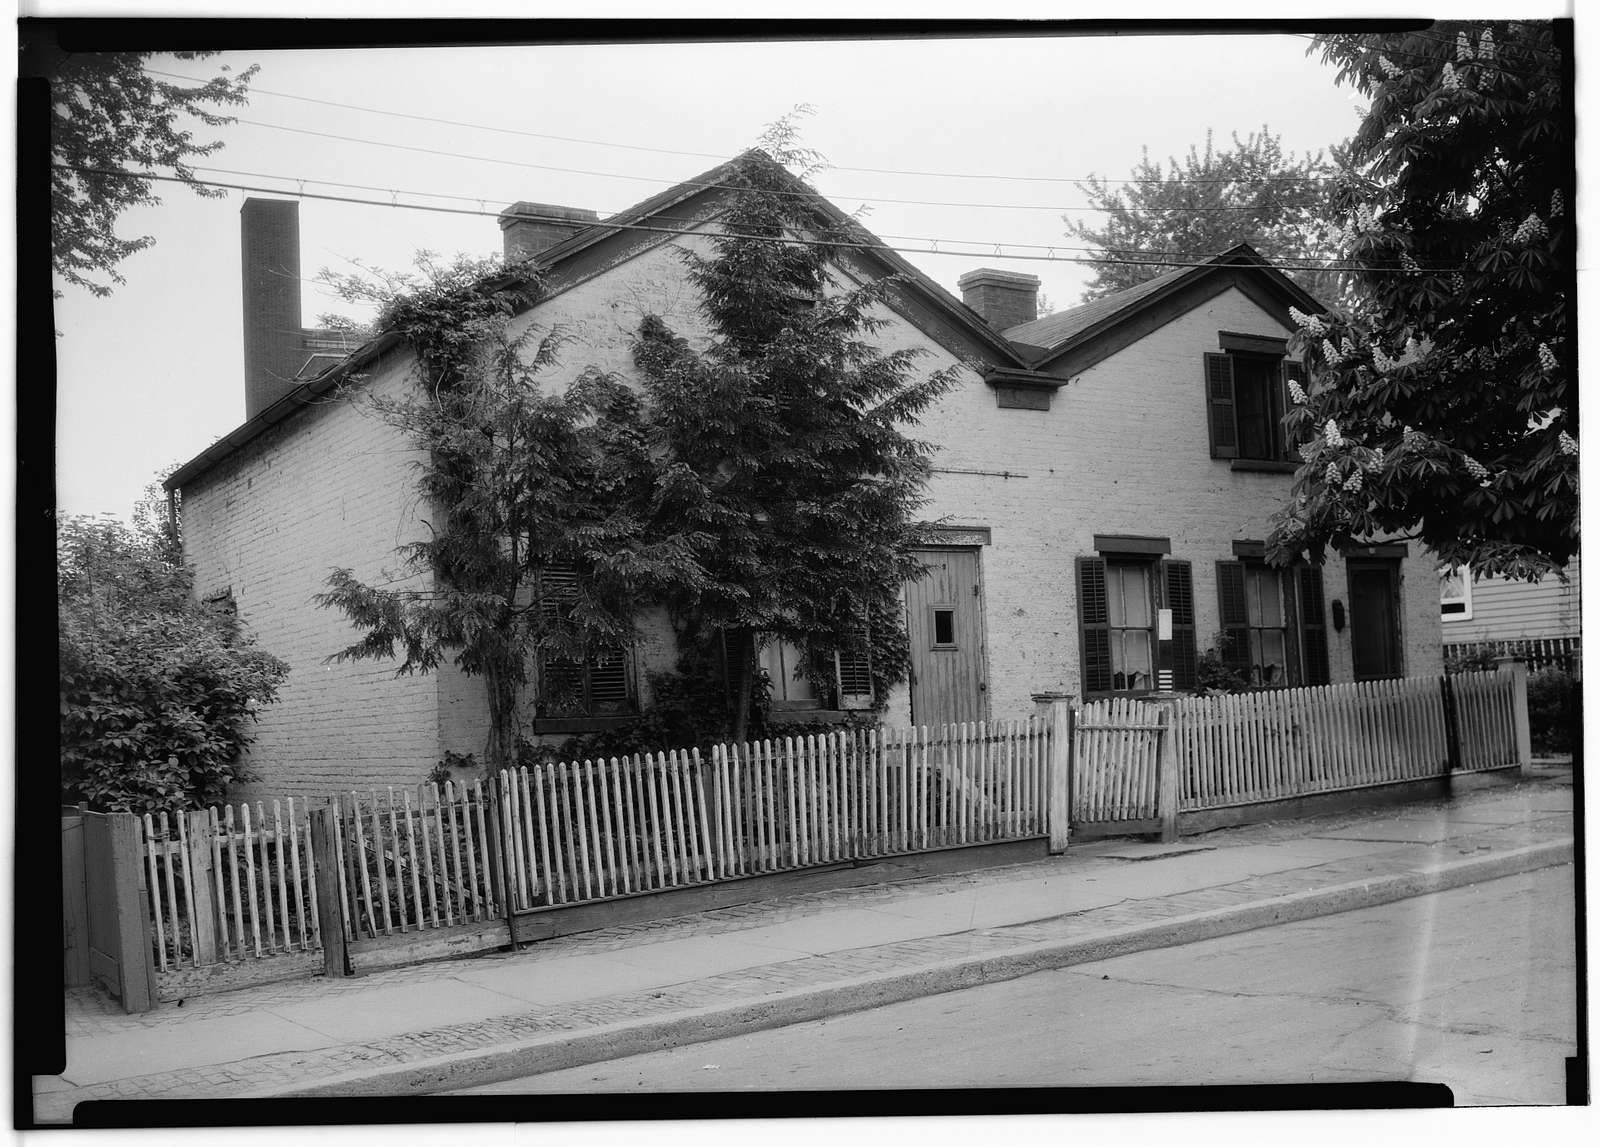 10-12 North Street (House), Schenectady, Schenectady County, NY